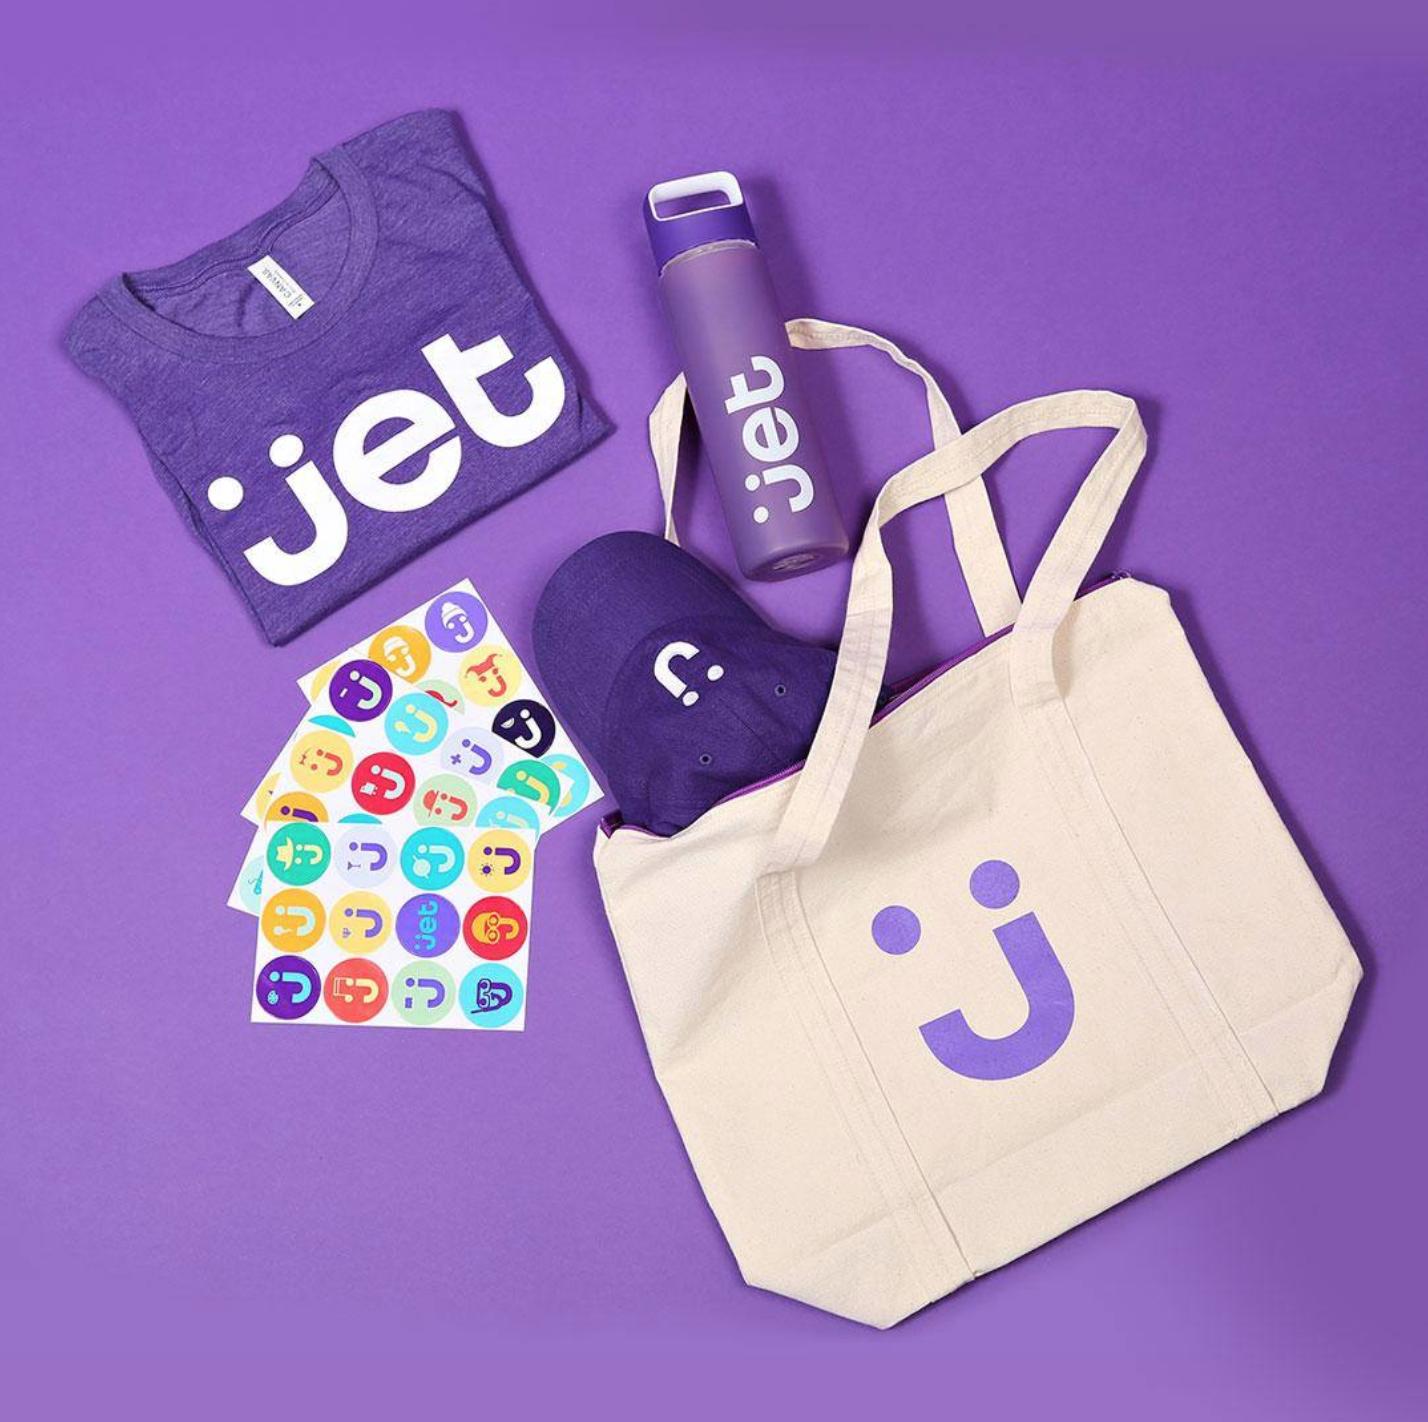 Posts for the Jet.com blog